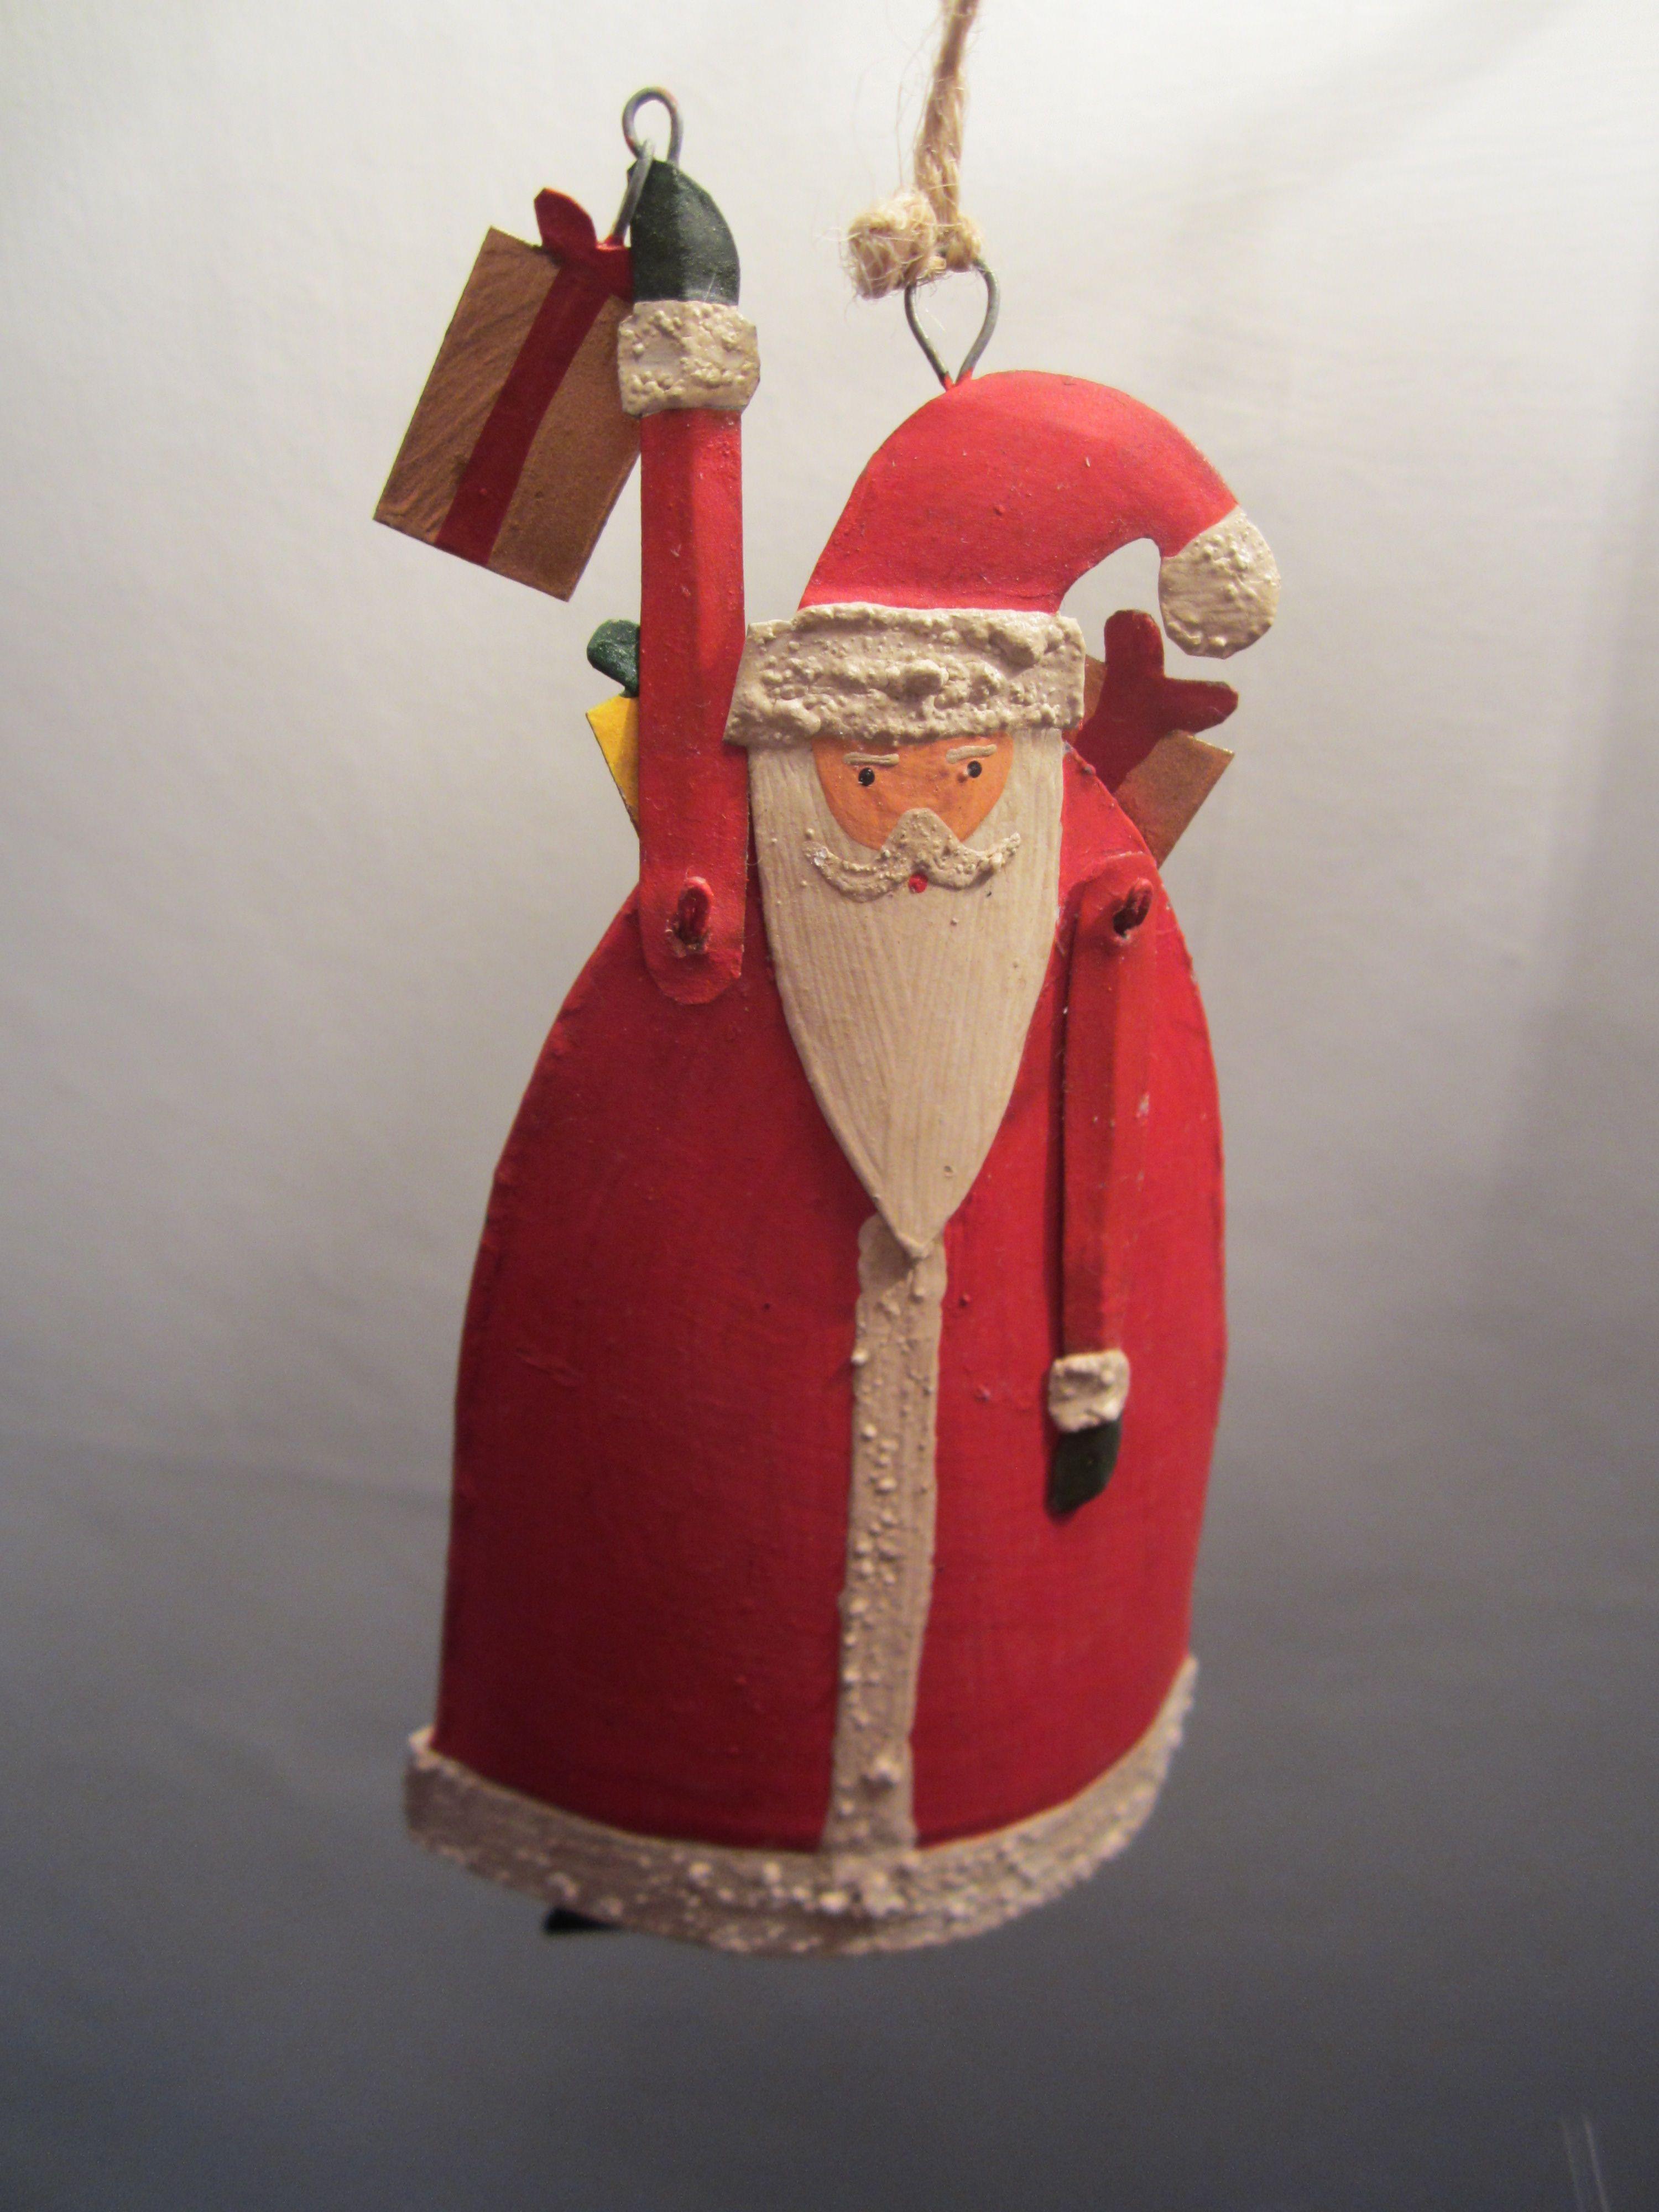 Tin Santa Carrying Presents